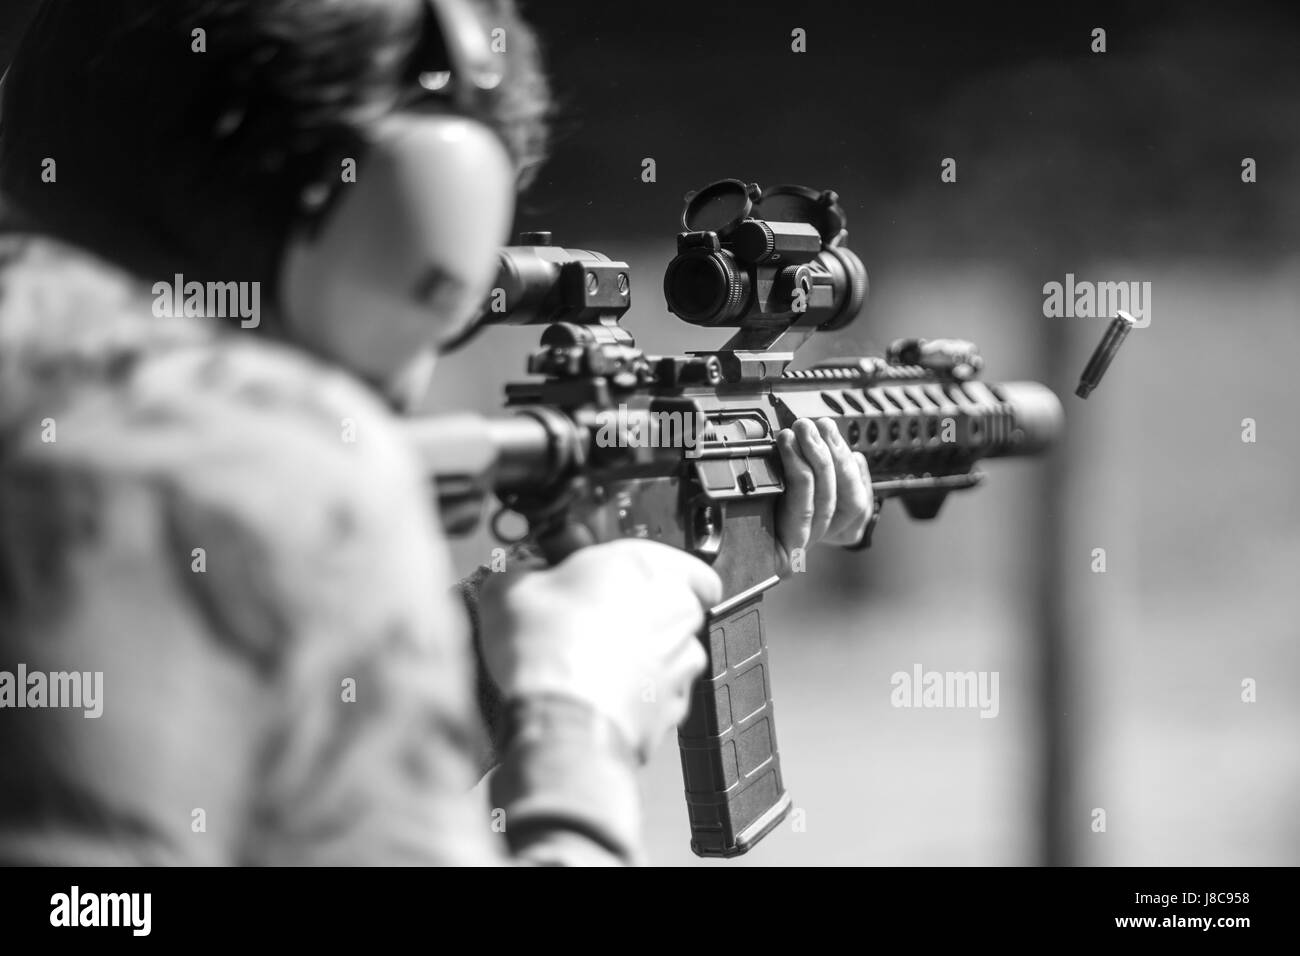 Shots with a machine gun - Stock Image